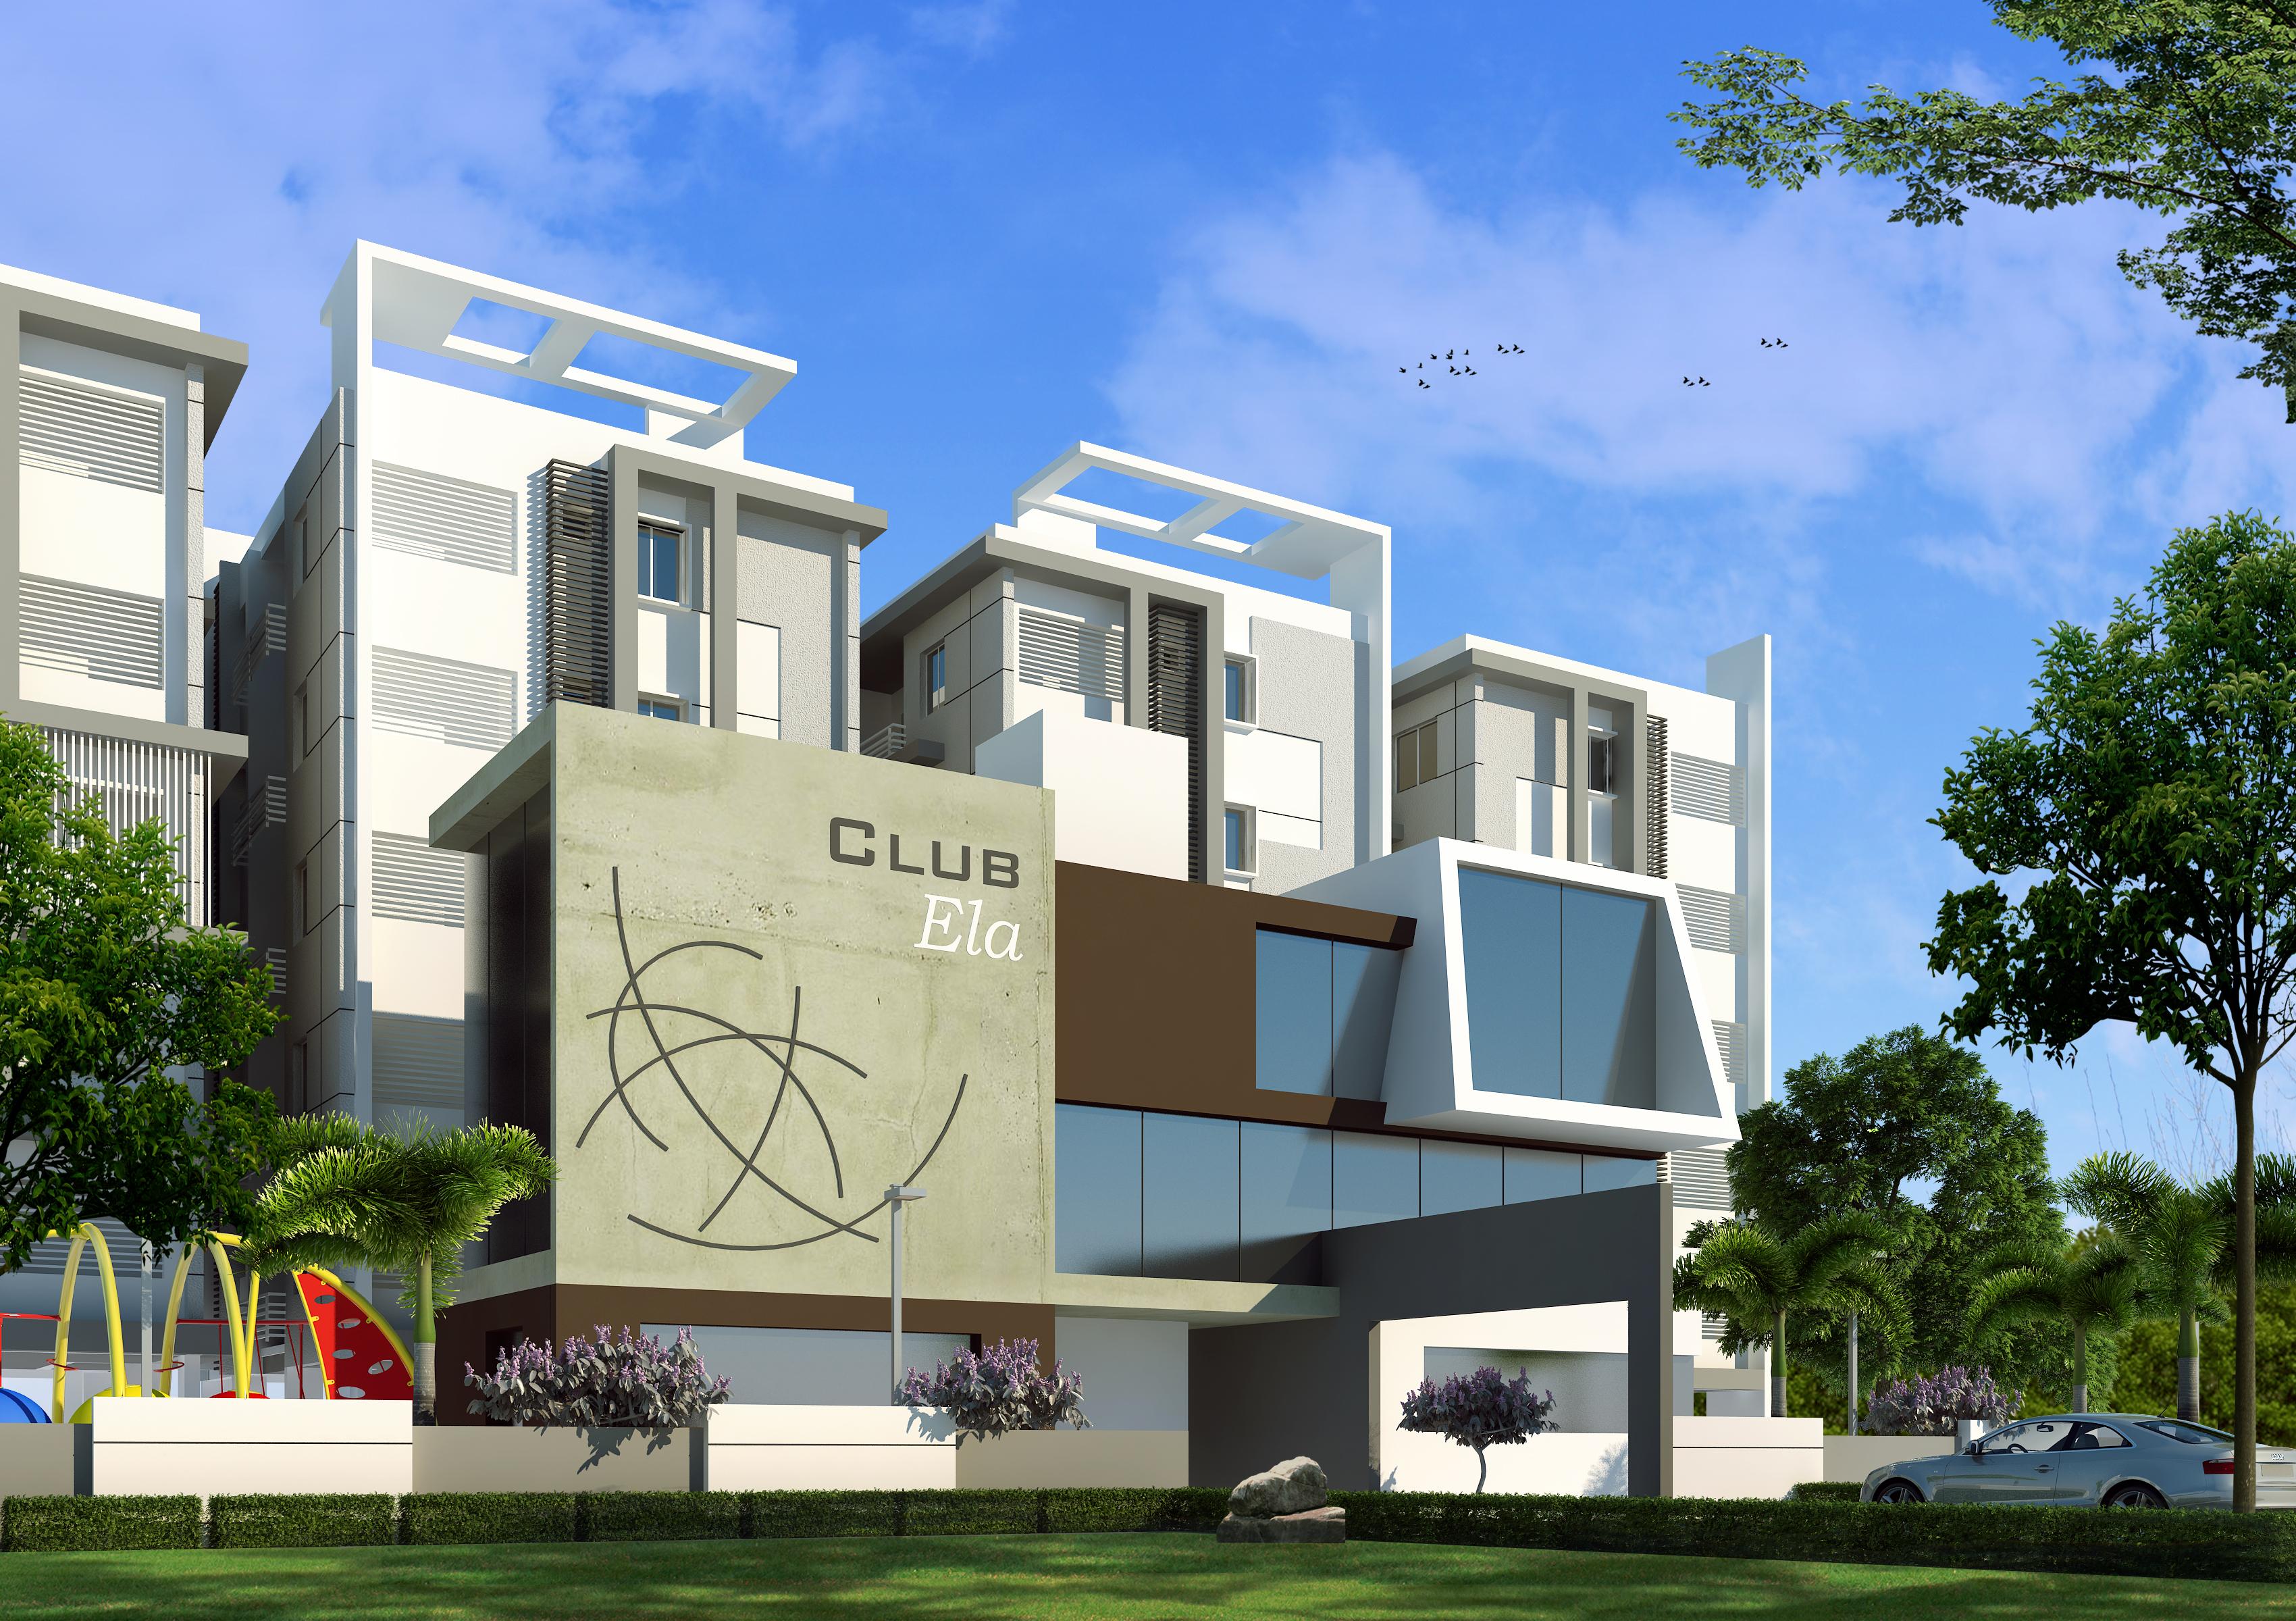 Club house view